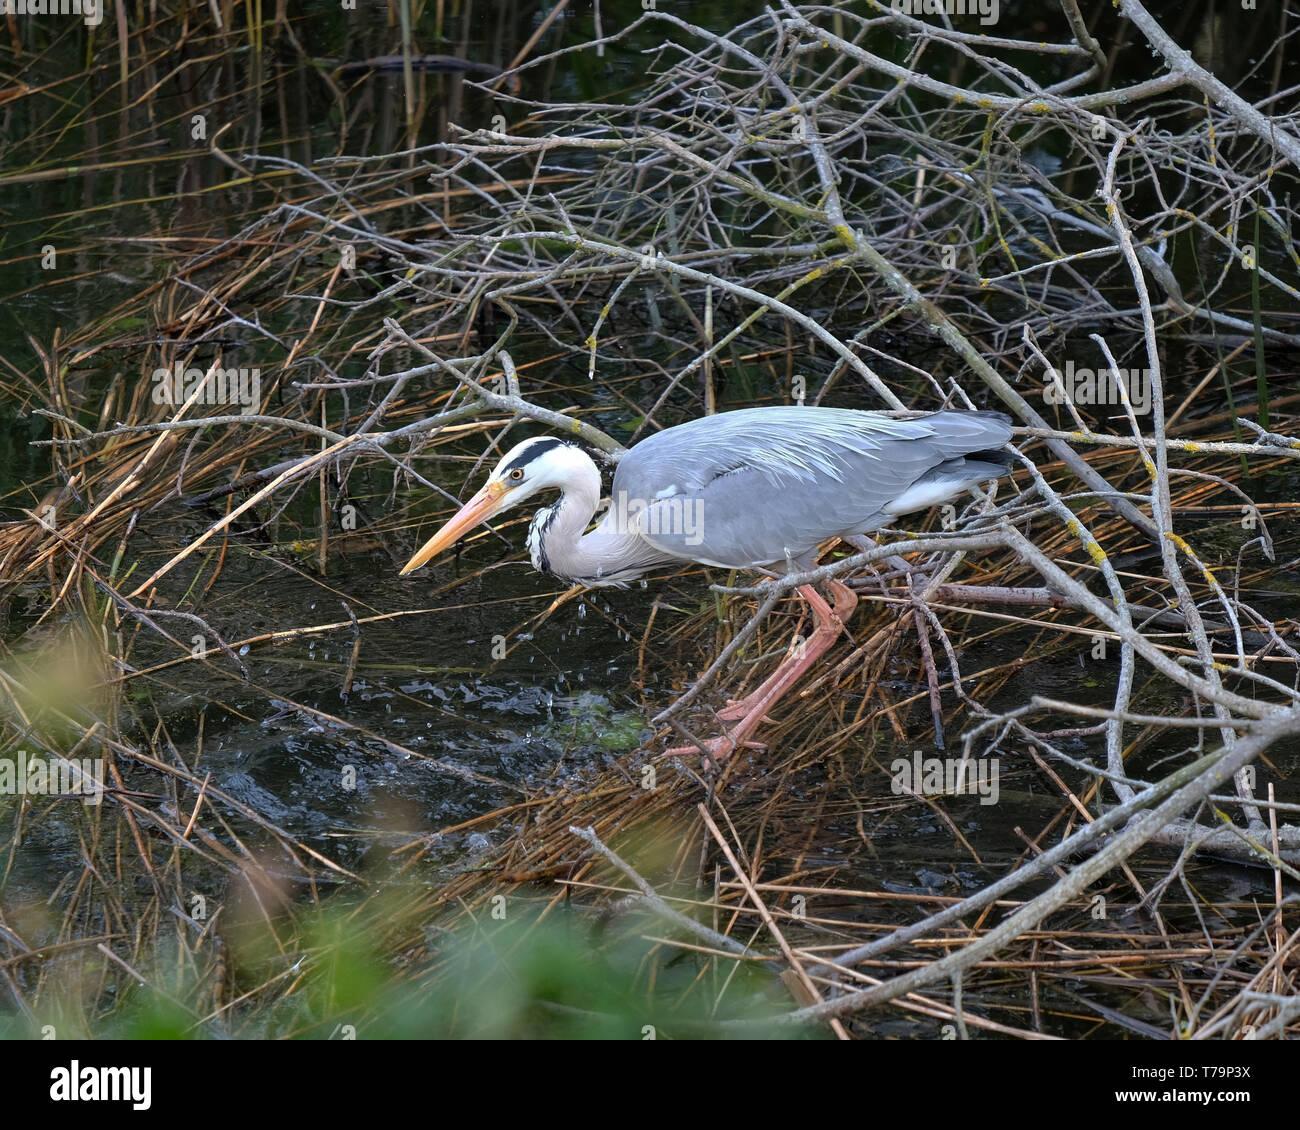 May 2019 - Grey Heron fishing - Stock Image